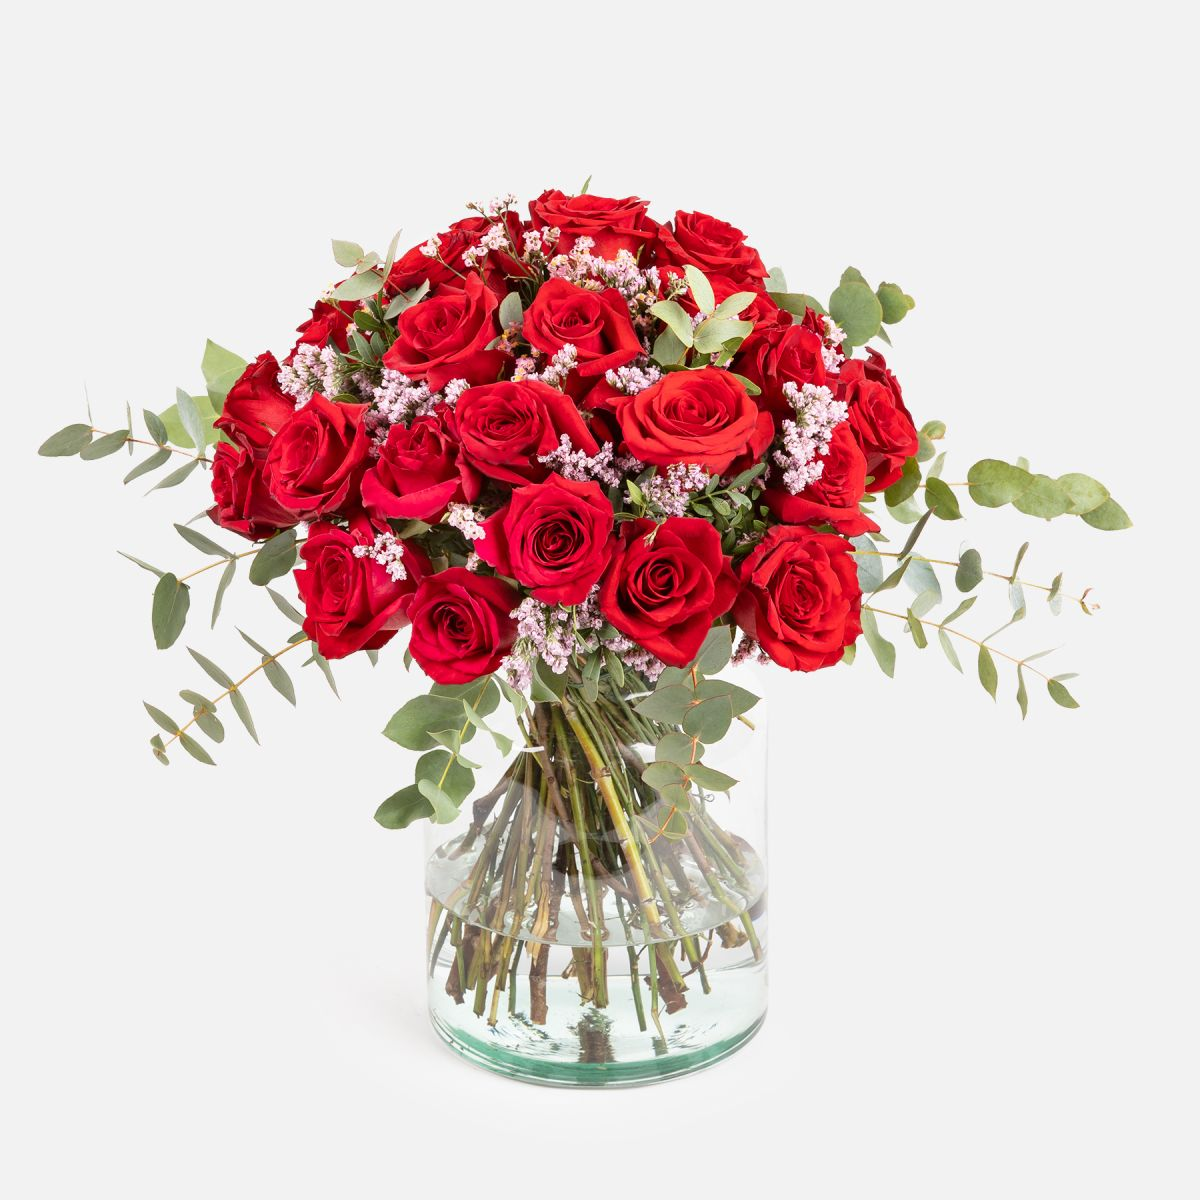 Radiant Red Roses